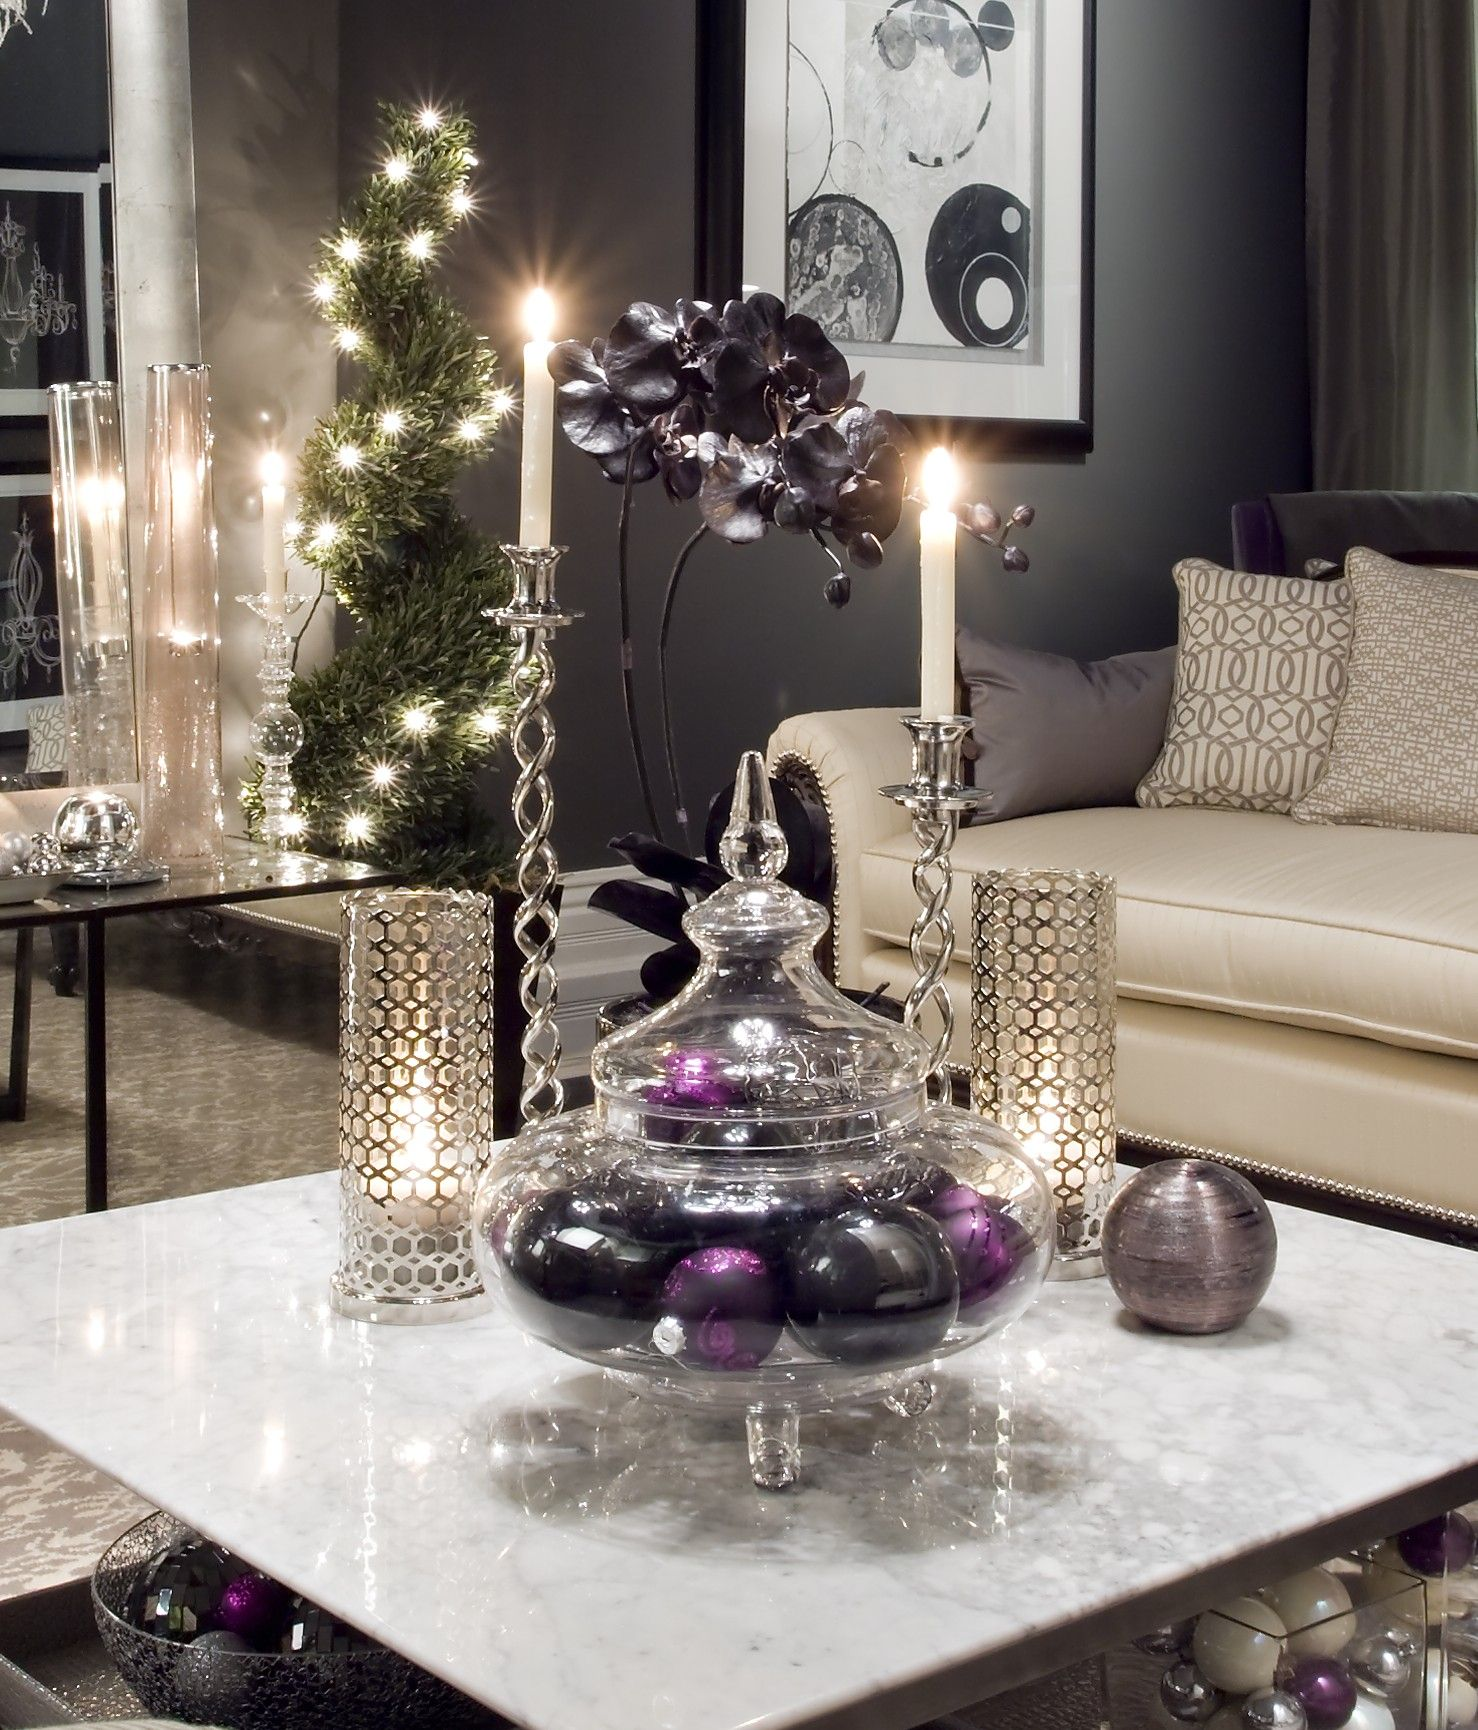 Coffee Table Decorating Ideas For Christmas Nafis Home Design Decor Candl Christmas Living Rooms Christmas Decorations Living Room Christmas Coffee Table Decor